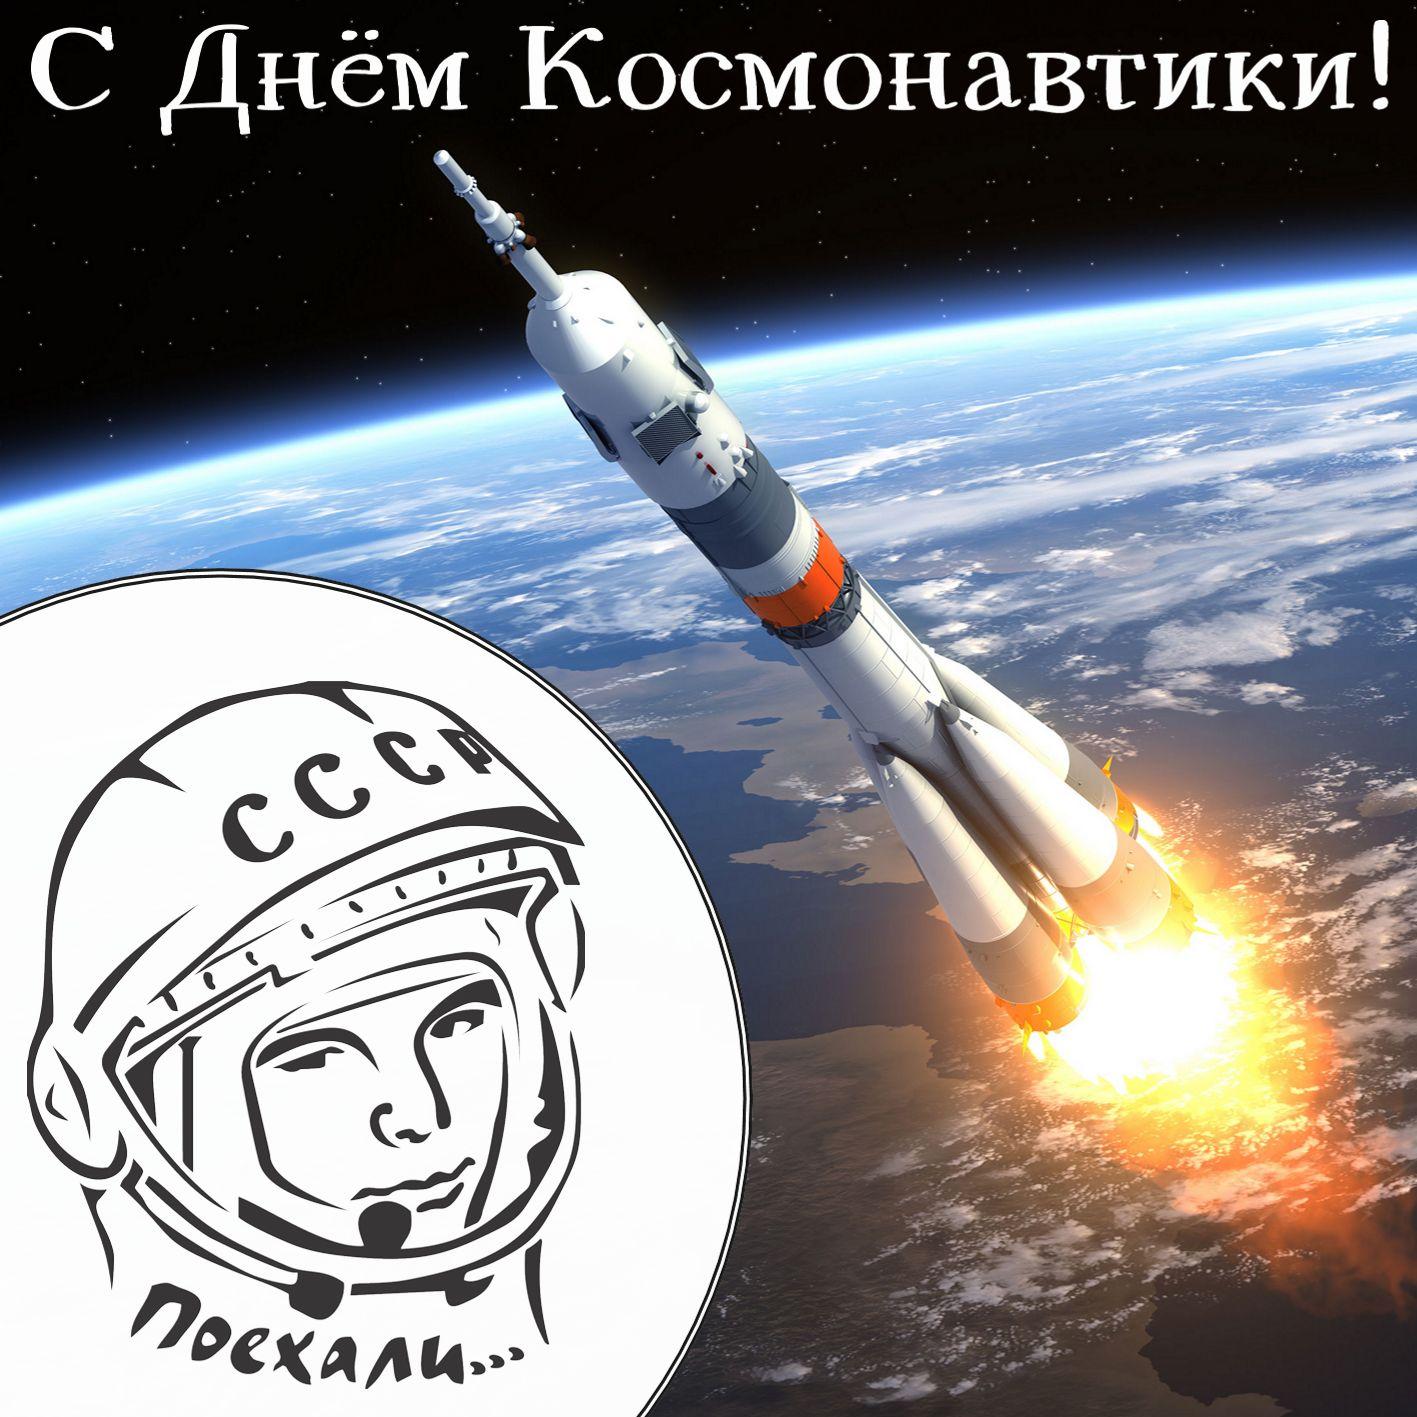 Ракета на фоне Земли с видом из космоса